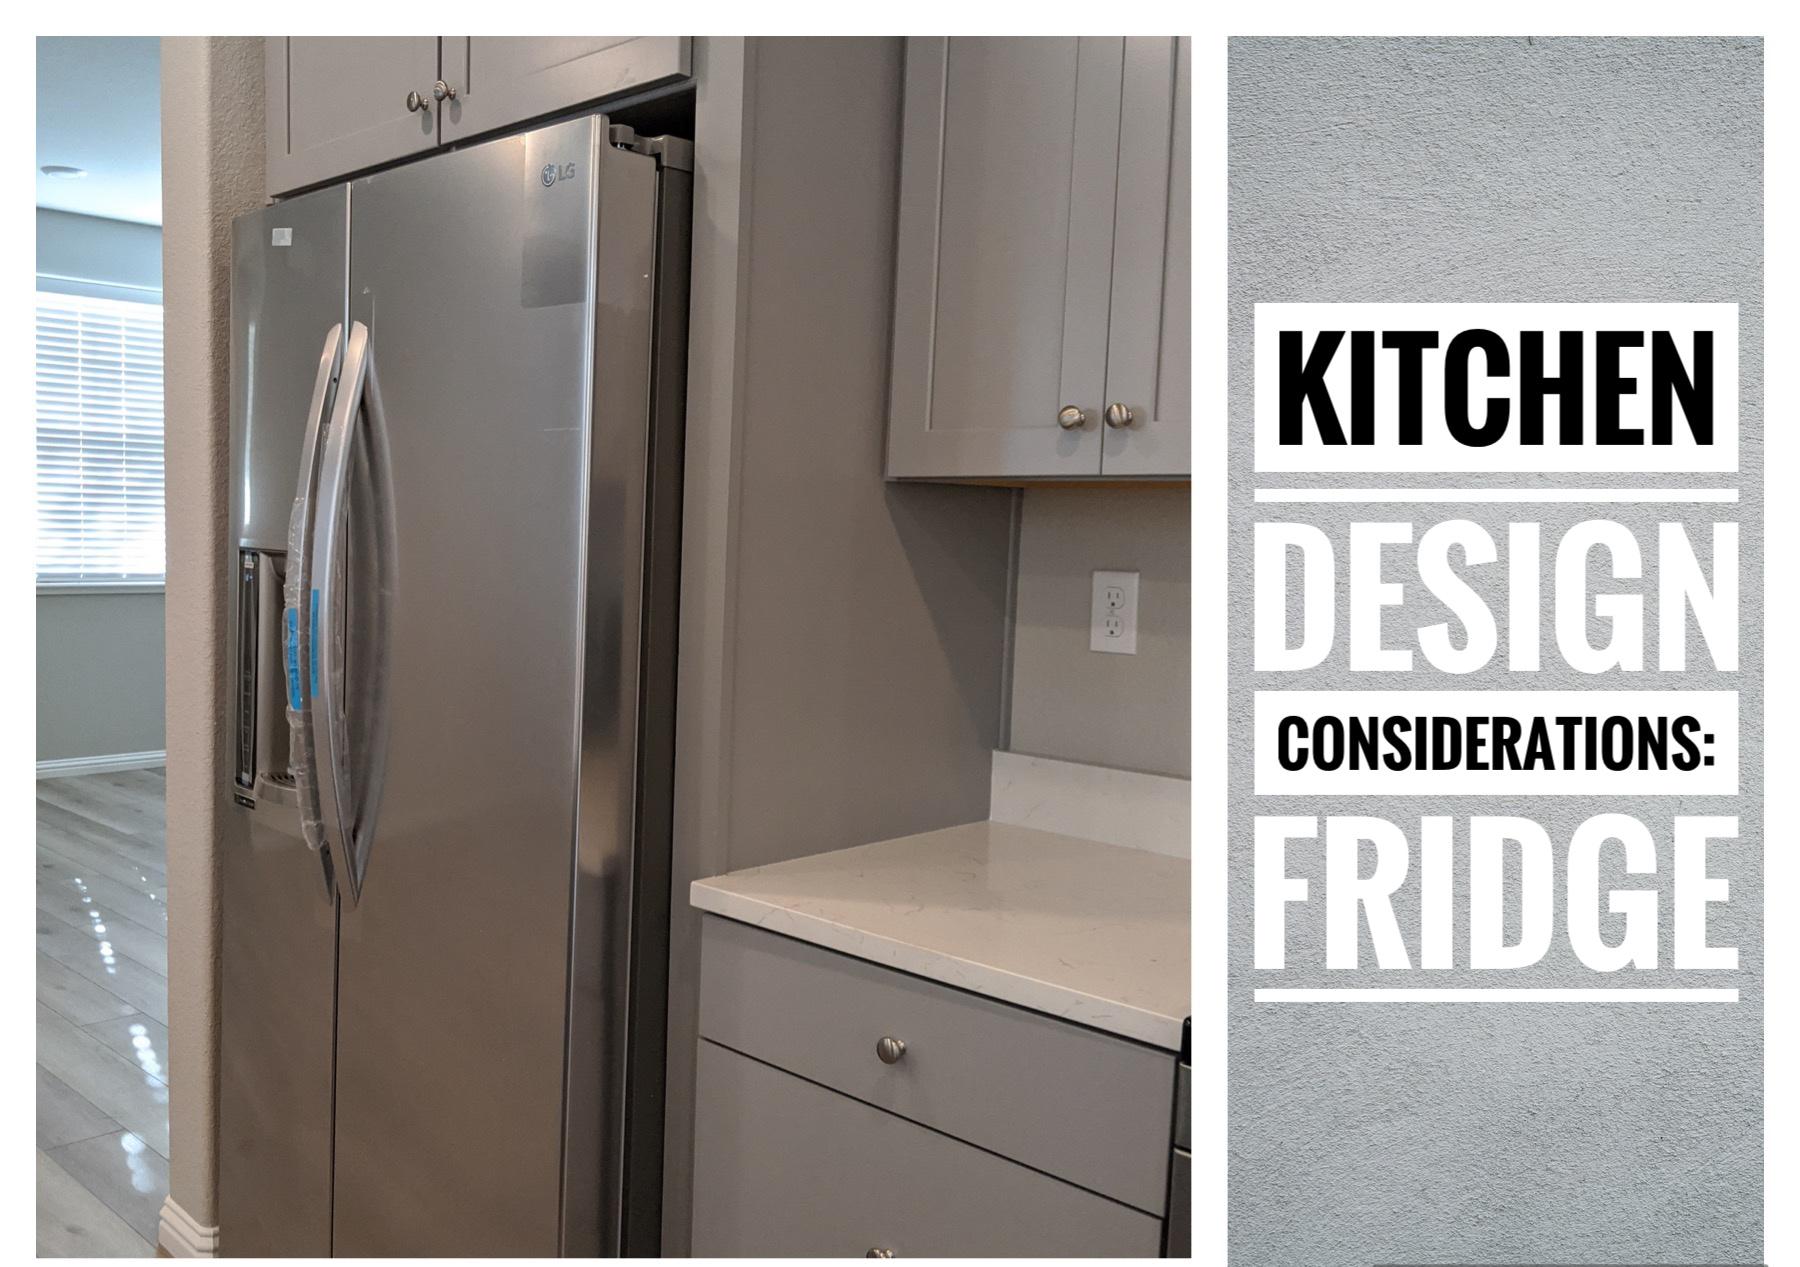 A thumbnail photo for kitchen design consideration- fridge